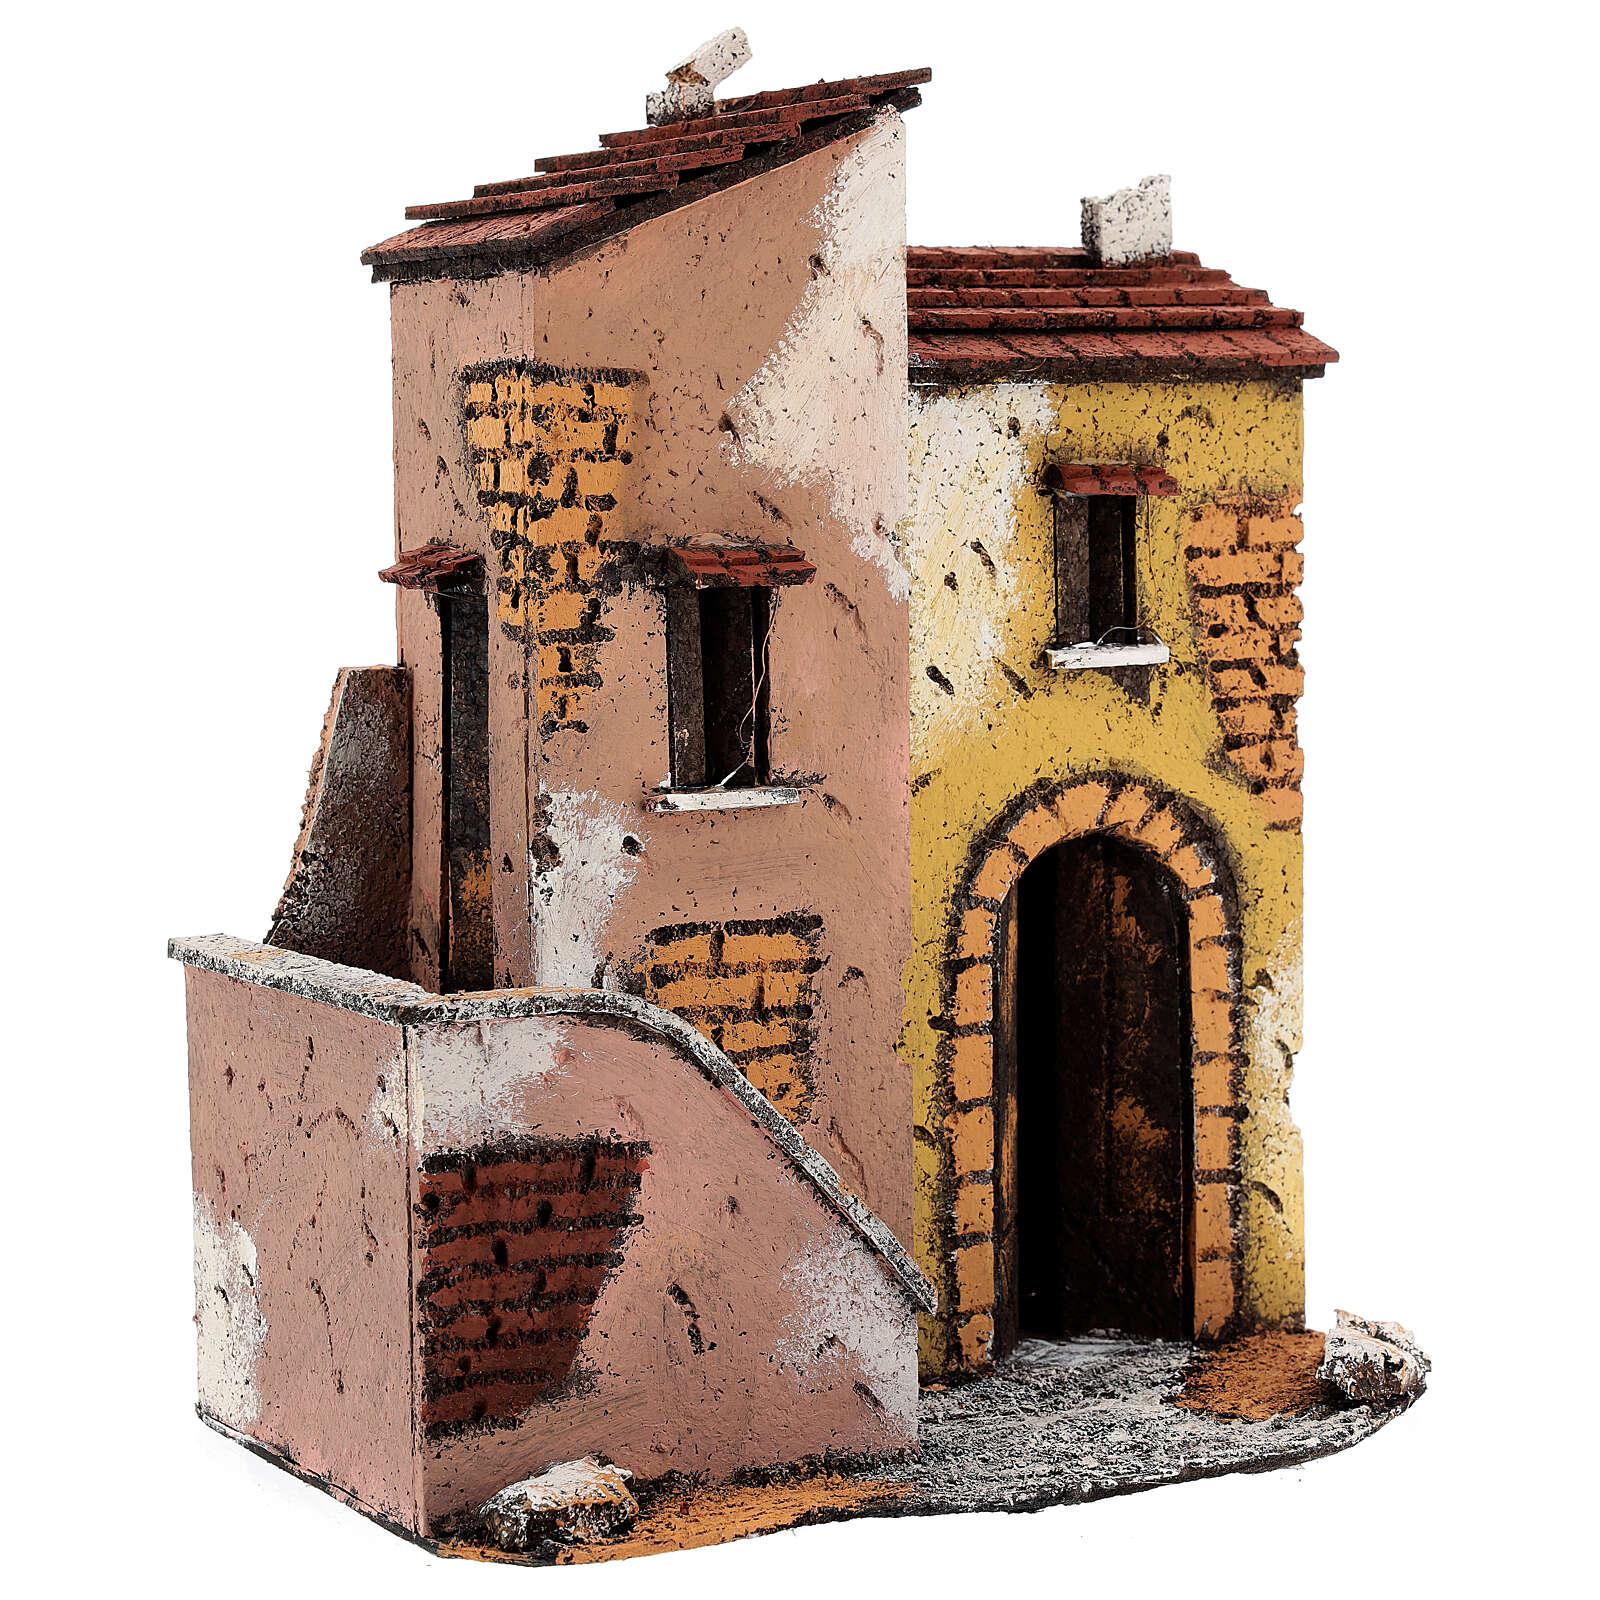 Adjacent houses for Neapolitan Nativity Scene 25x25x15 cm for 8-10 cm figurines 4